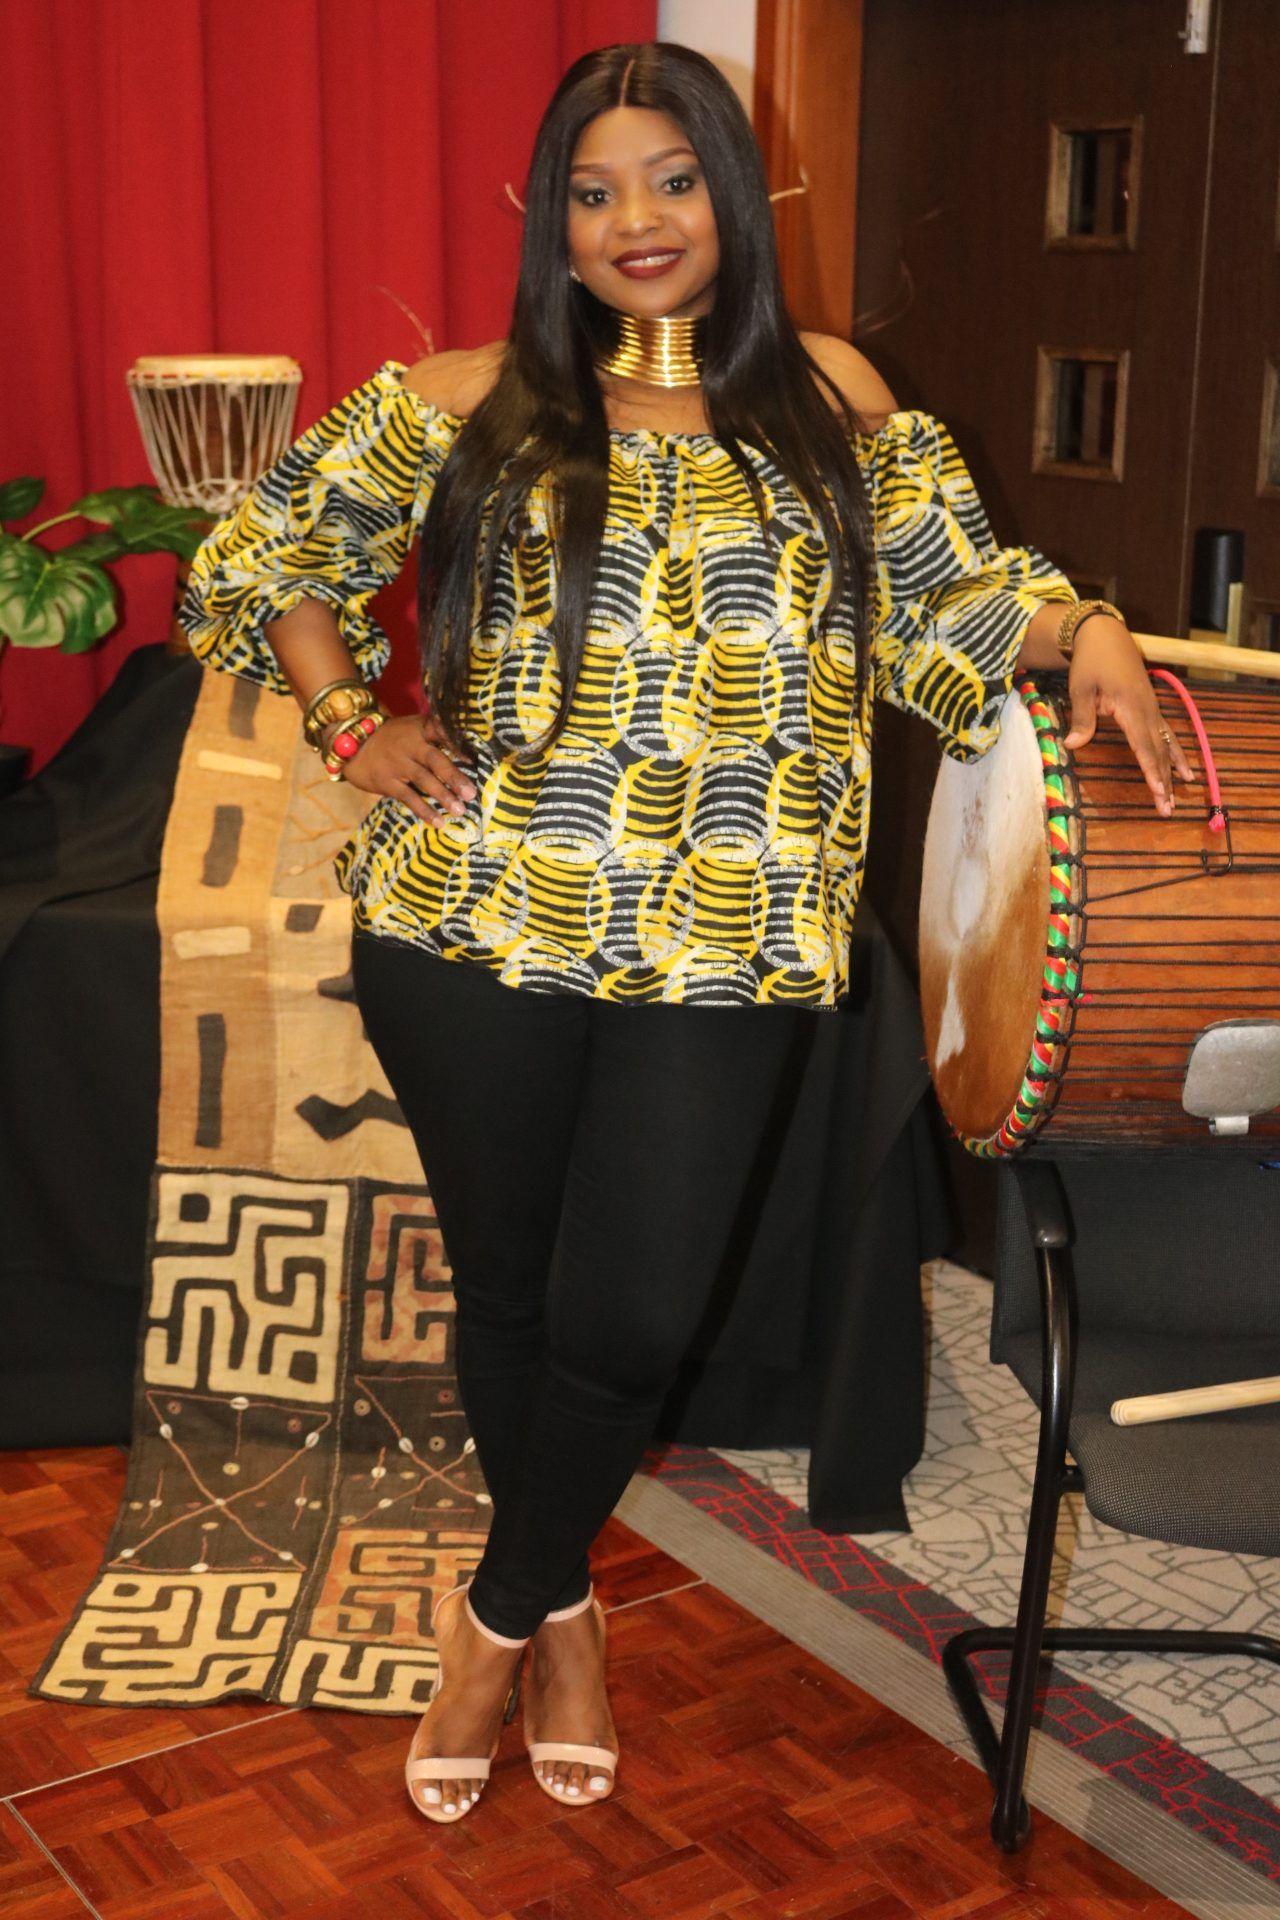 5949de6e1e8 Wakanda Theme Baby Shower Ideas  Ankara  Ankarastyles  ankarafashionstyles   anakrafashion  ankaraasoebi  asoebi  bellanaija  africanfashion ...